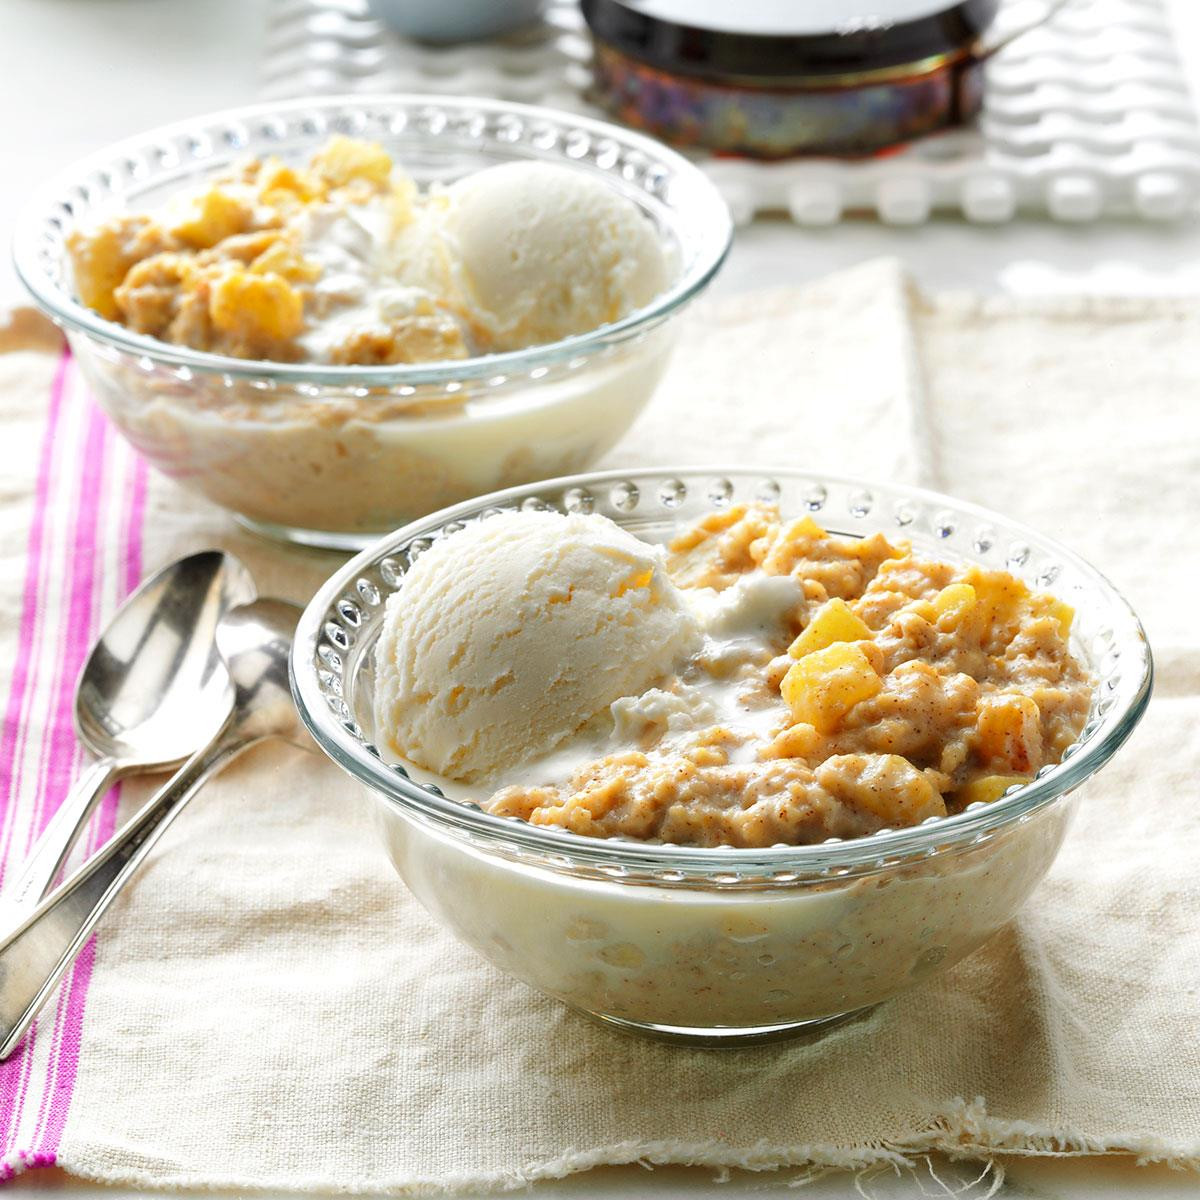 Oatmeal Dessert Recipes  Apple Pie Oatmeal Dessert Recipe